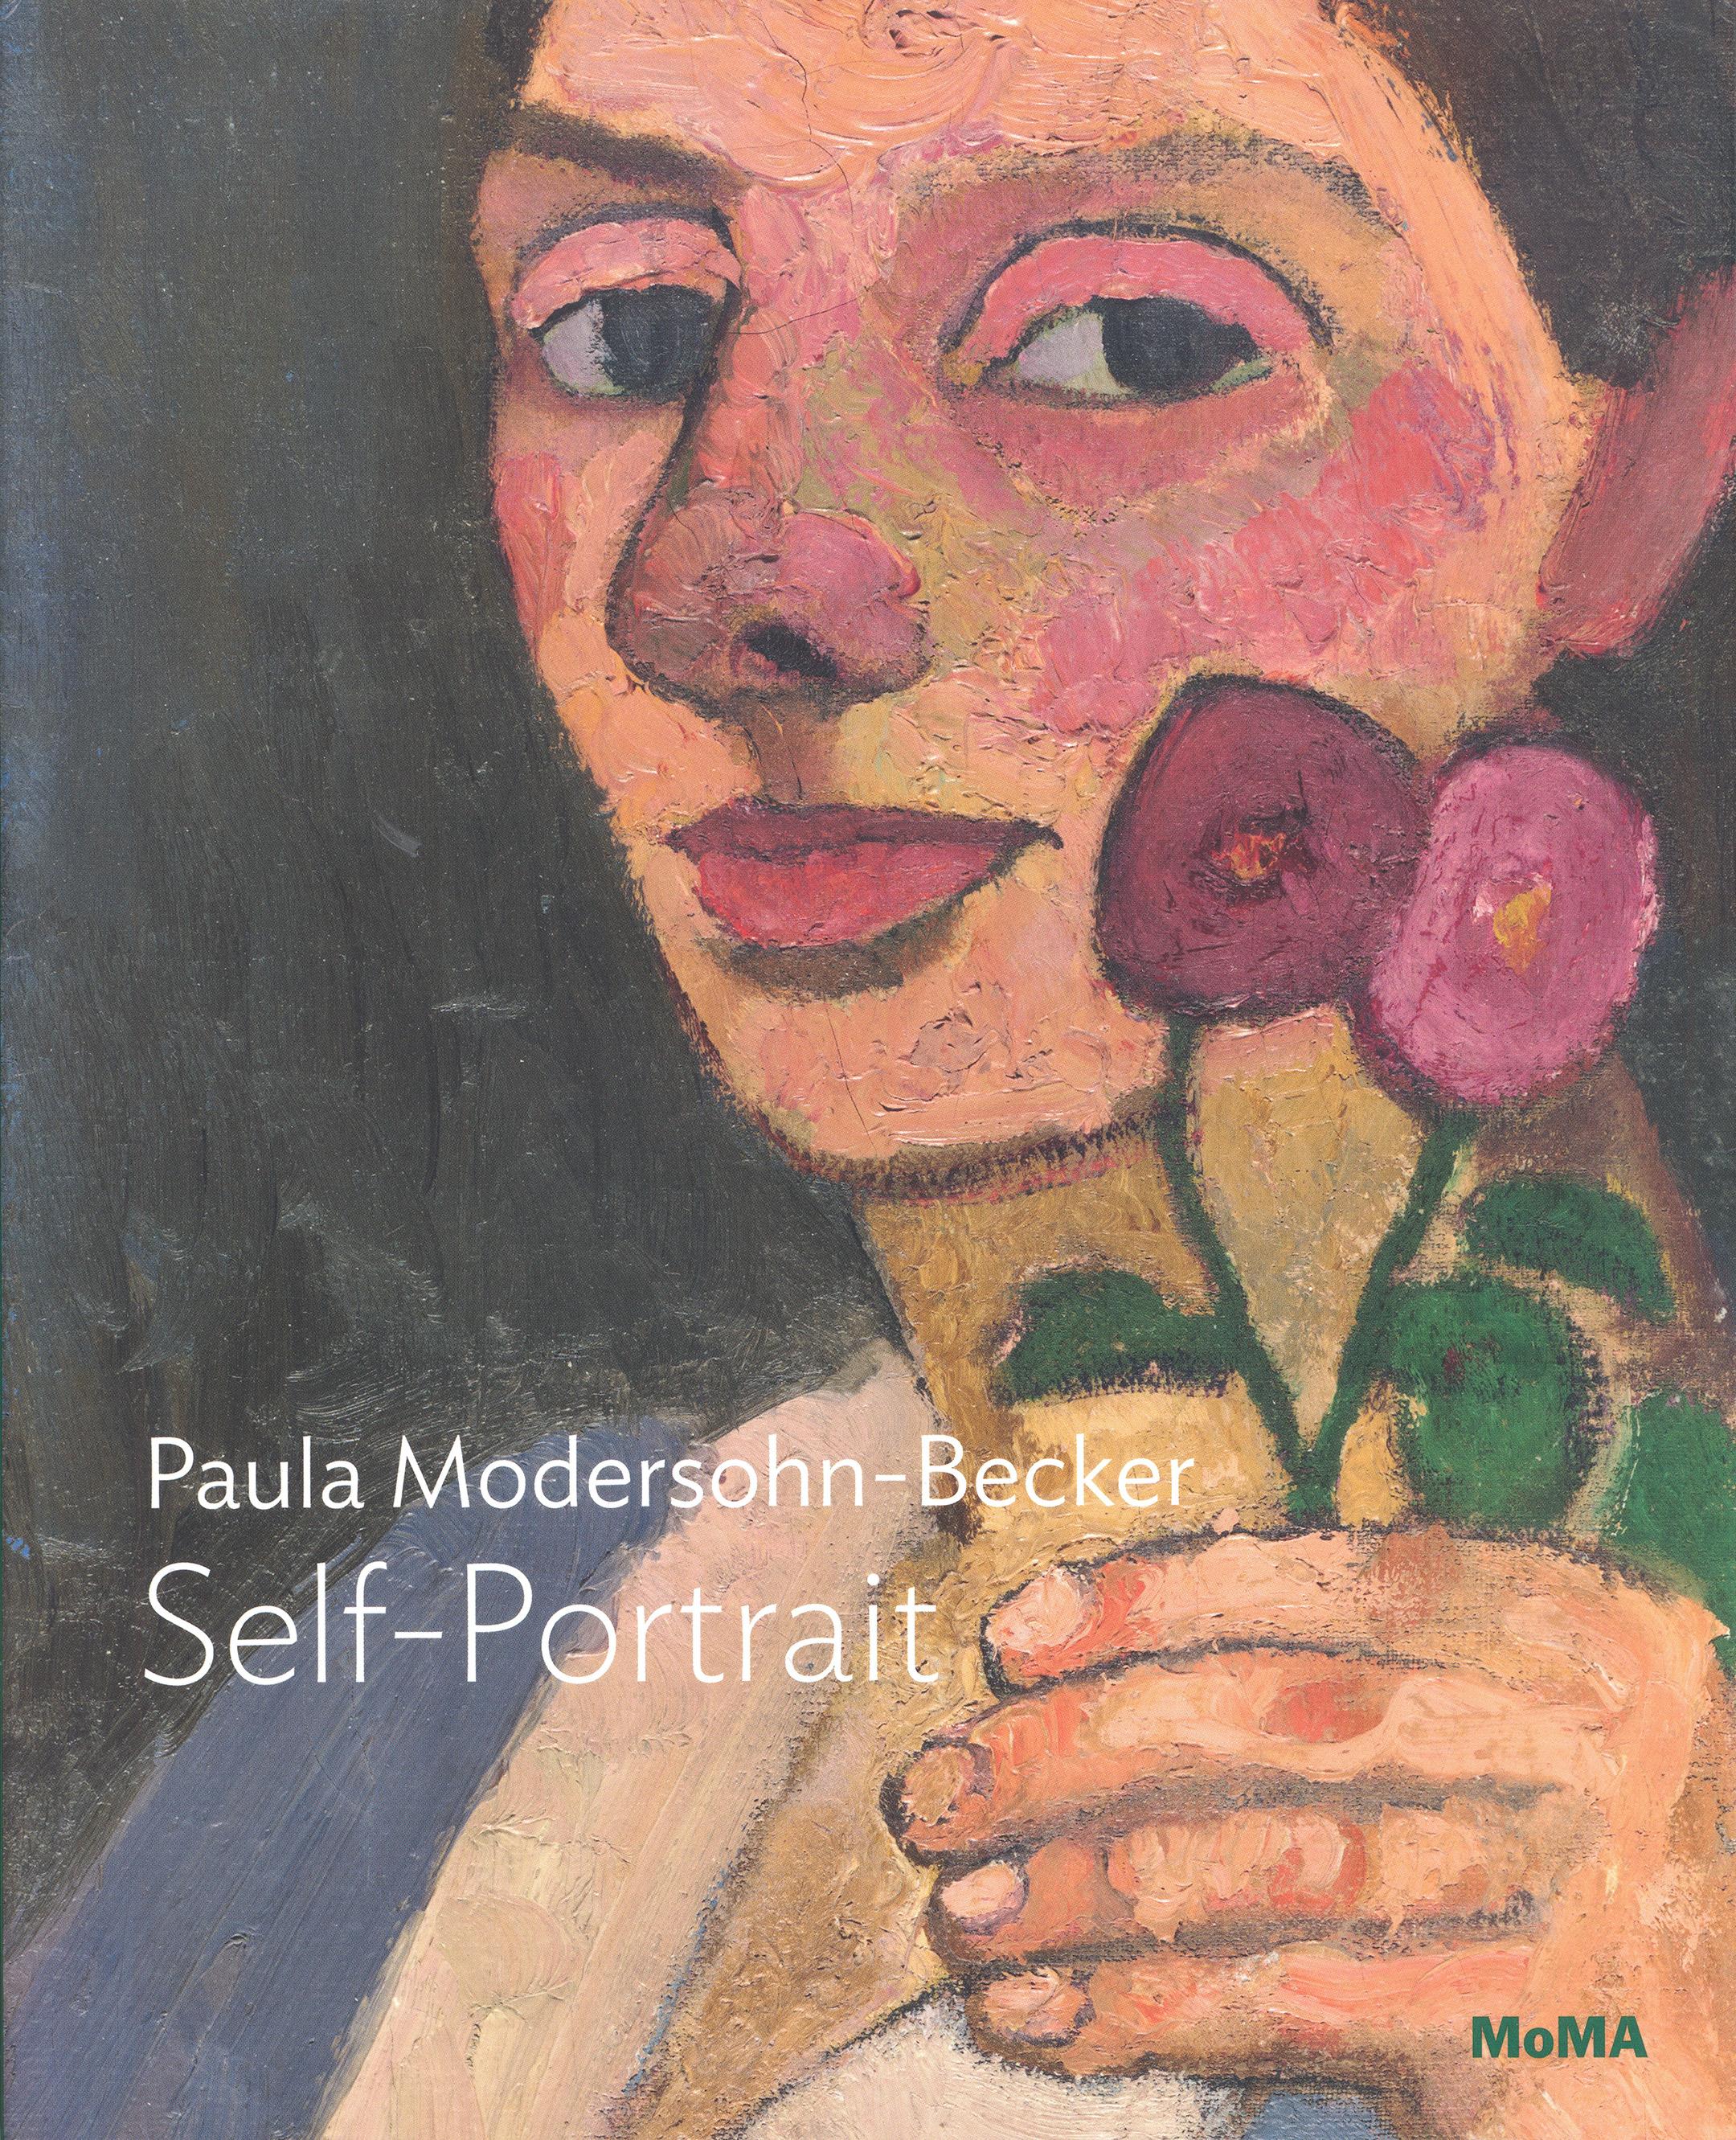 Paula Modersohn-Becker: Self-Portrait book by Dr. Diane Radycki, 2018,MoMA Publications